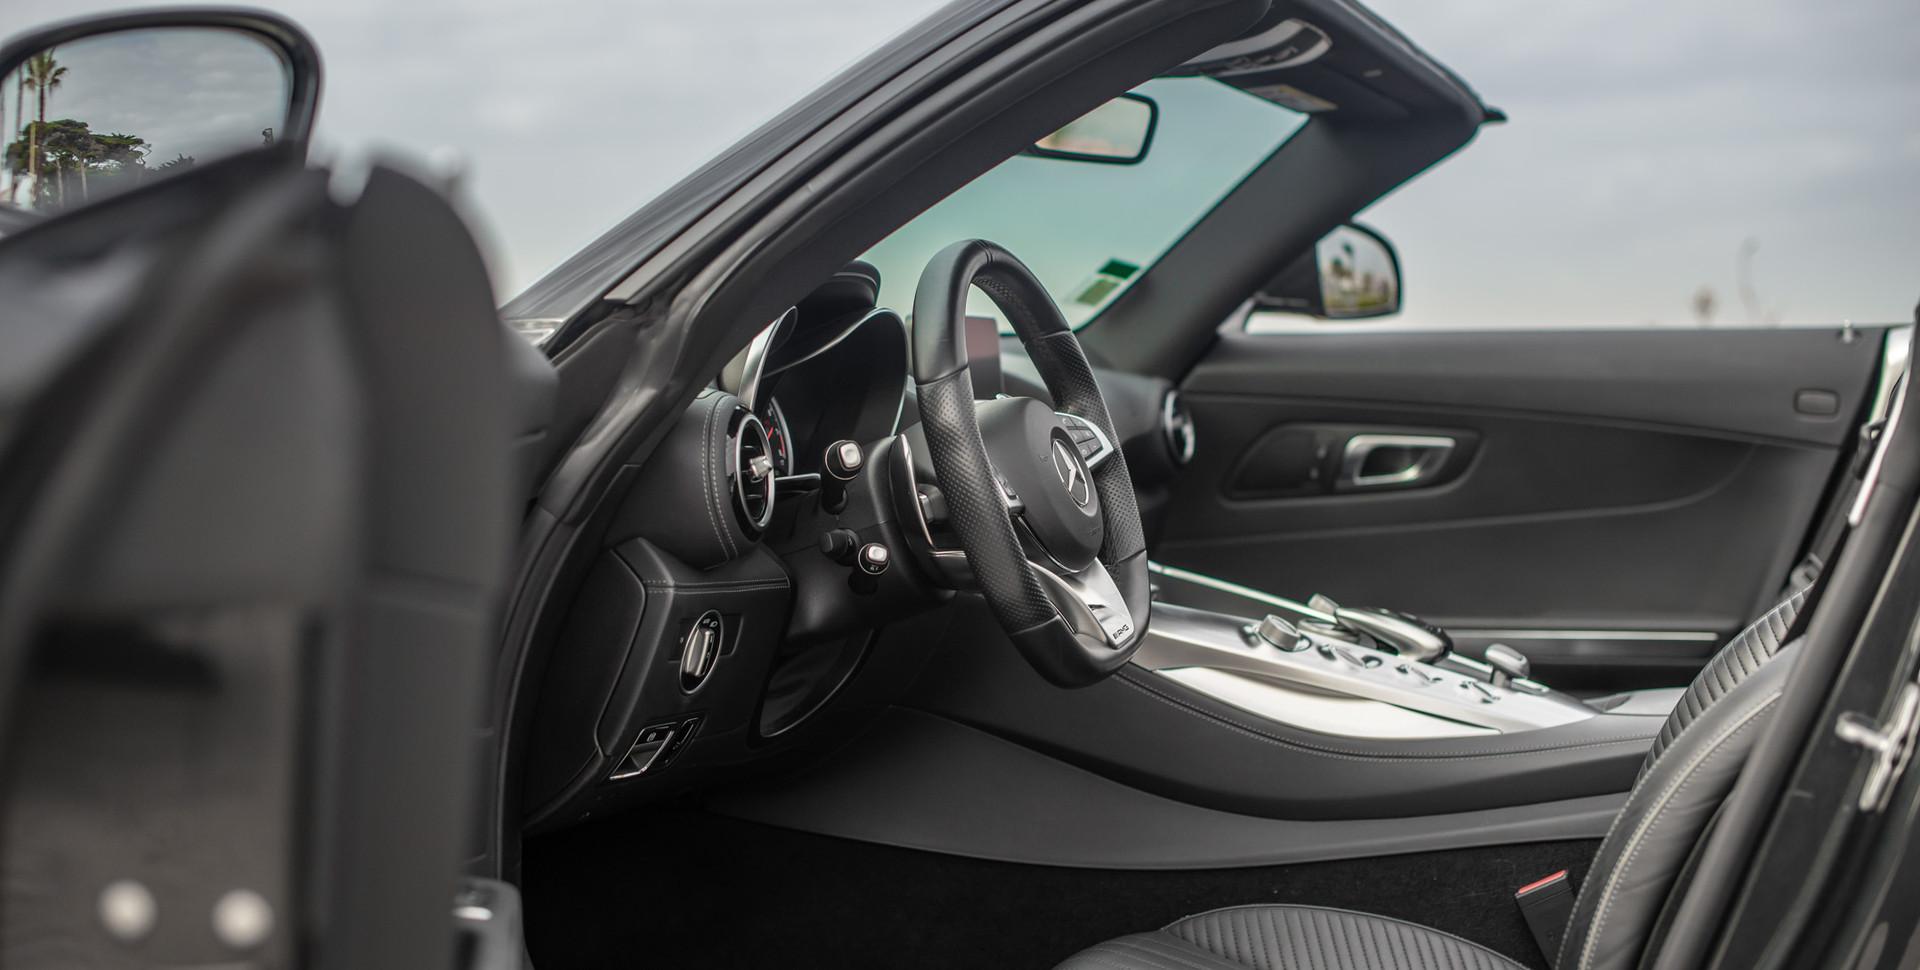 MB AMG GT Cabrio-12.jpg.JPG